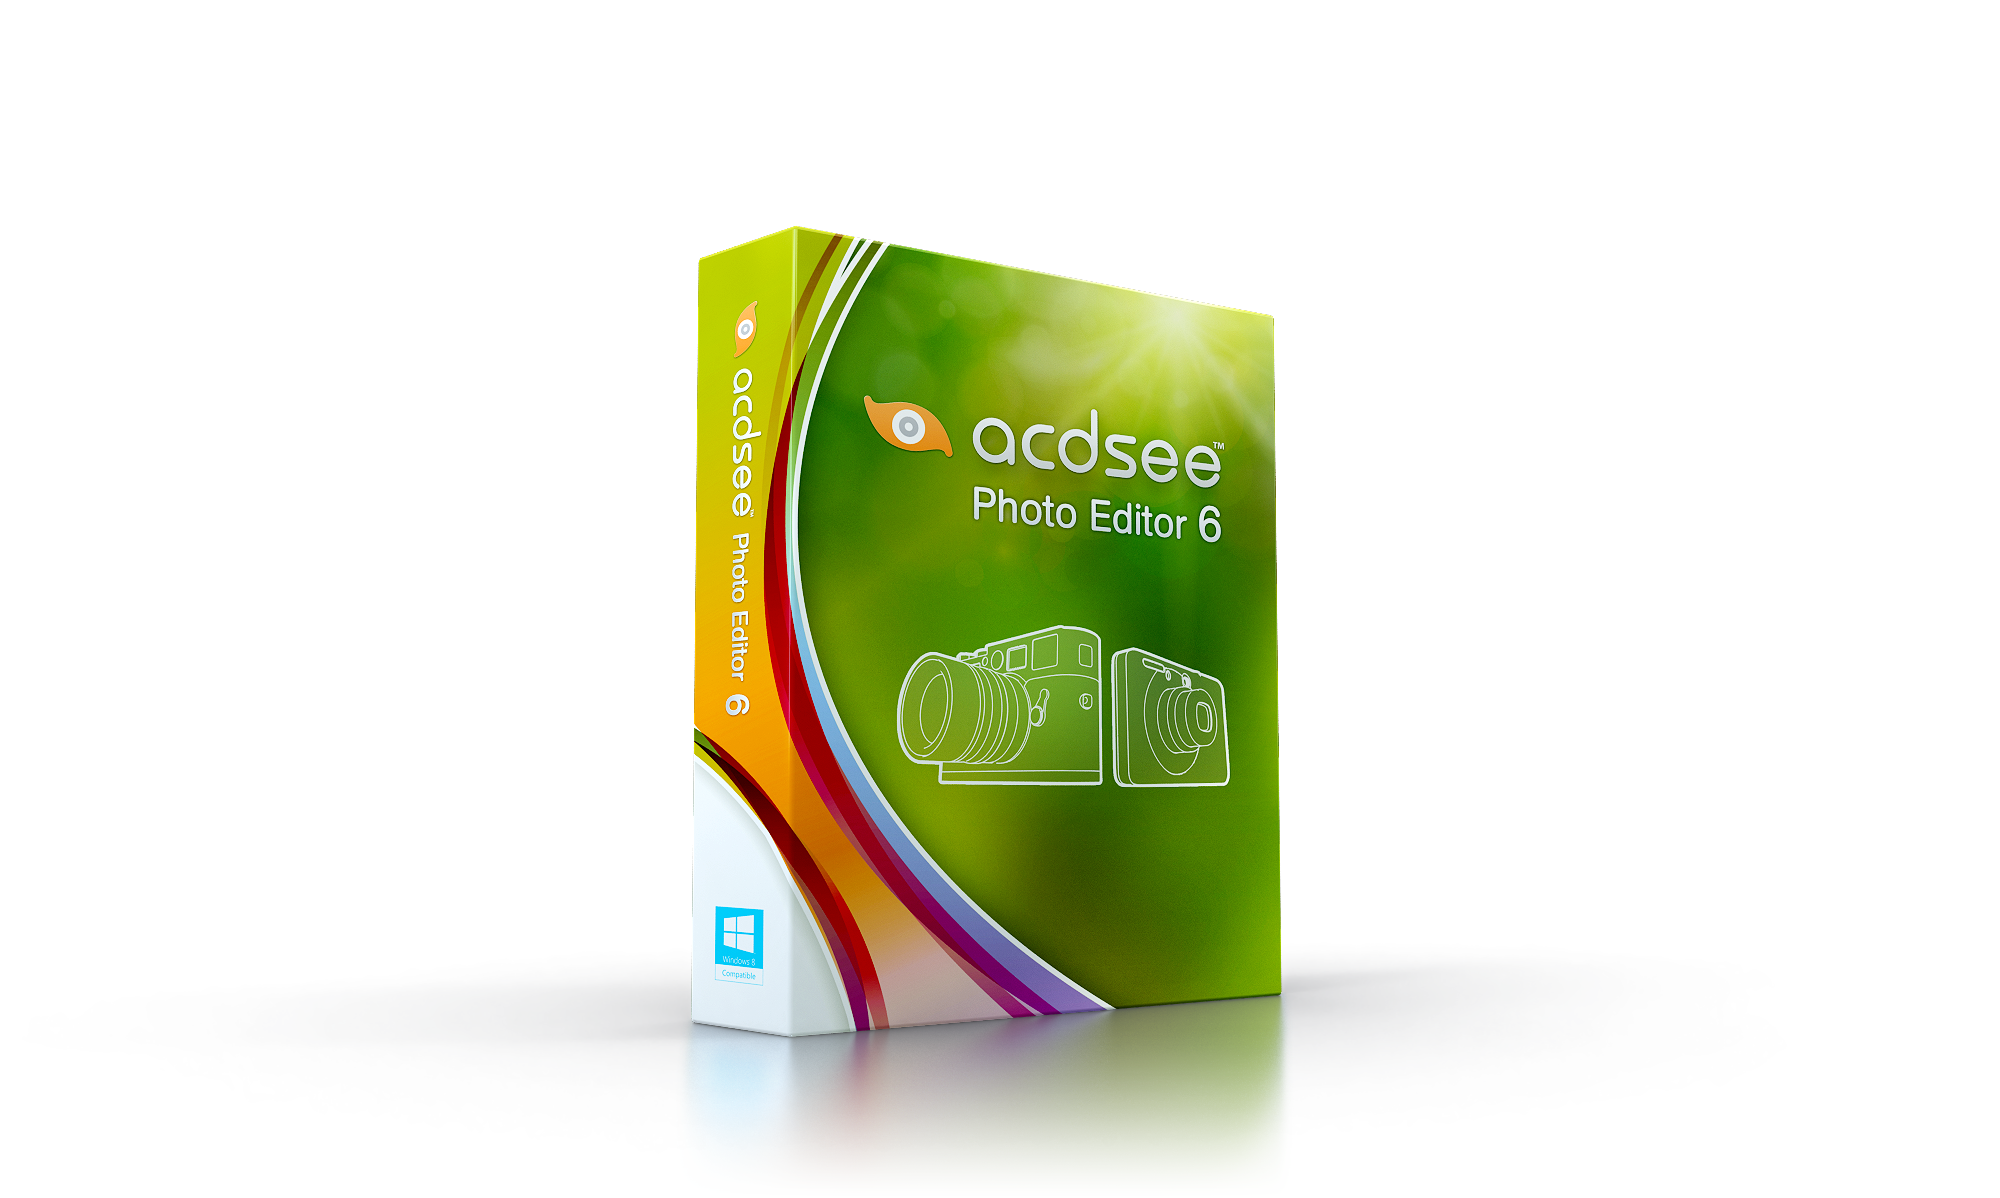 ACDSee Photo Editor 6 Product Kit